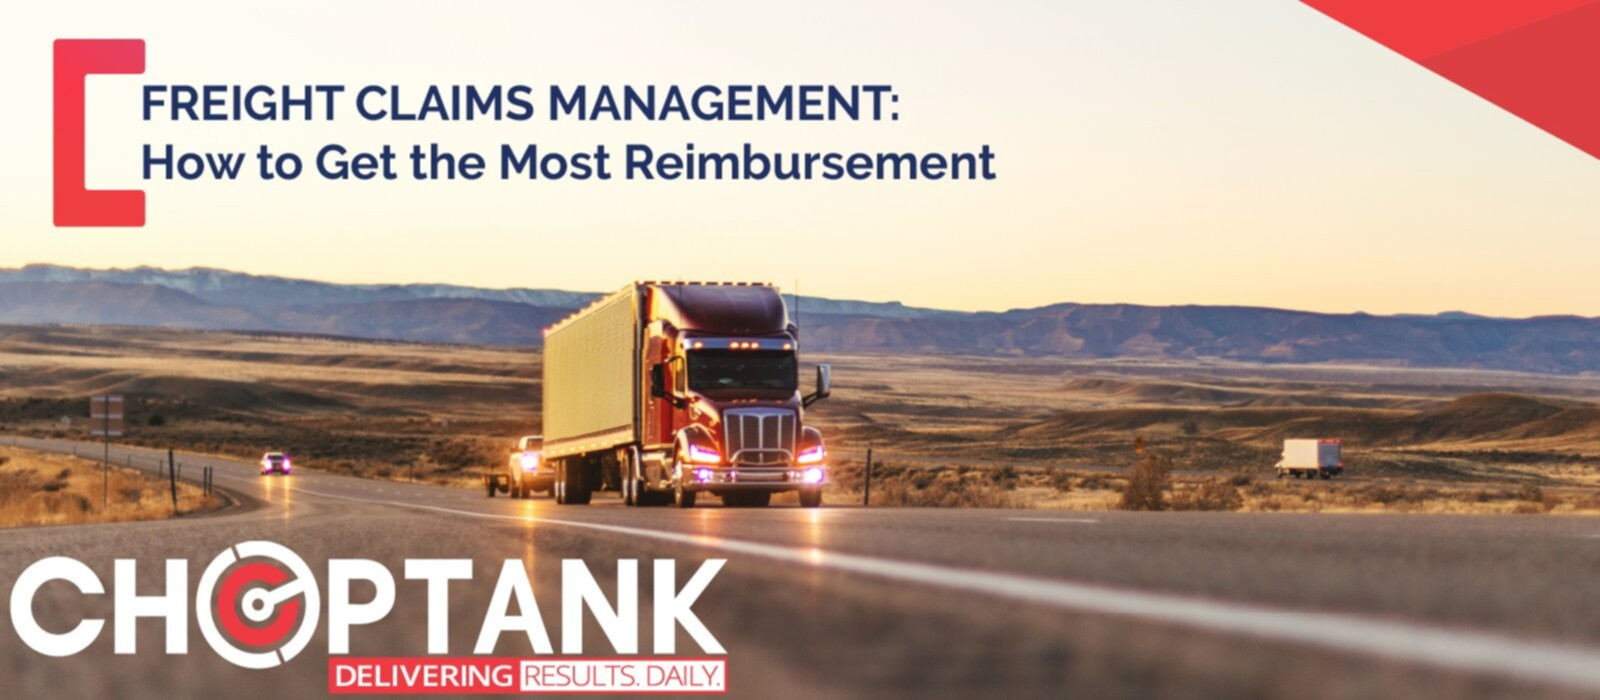 freightclaimsmanagement